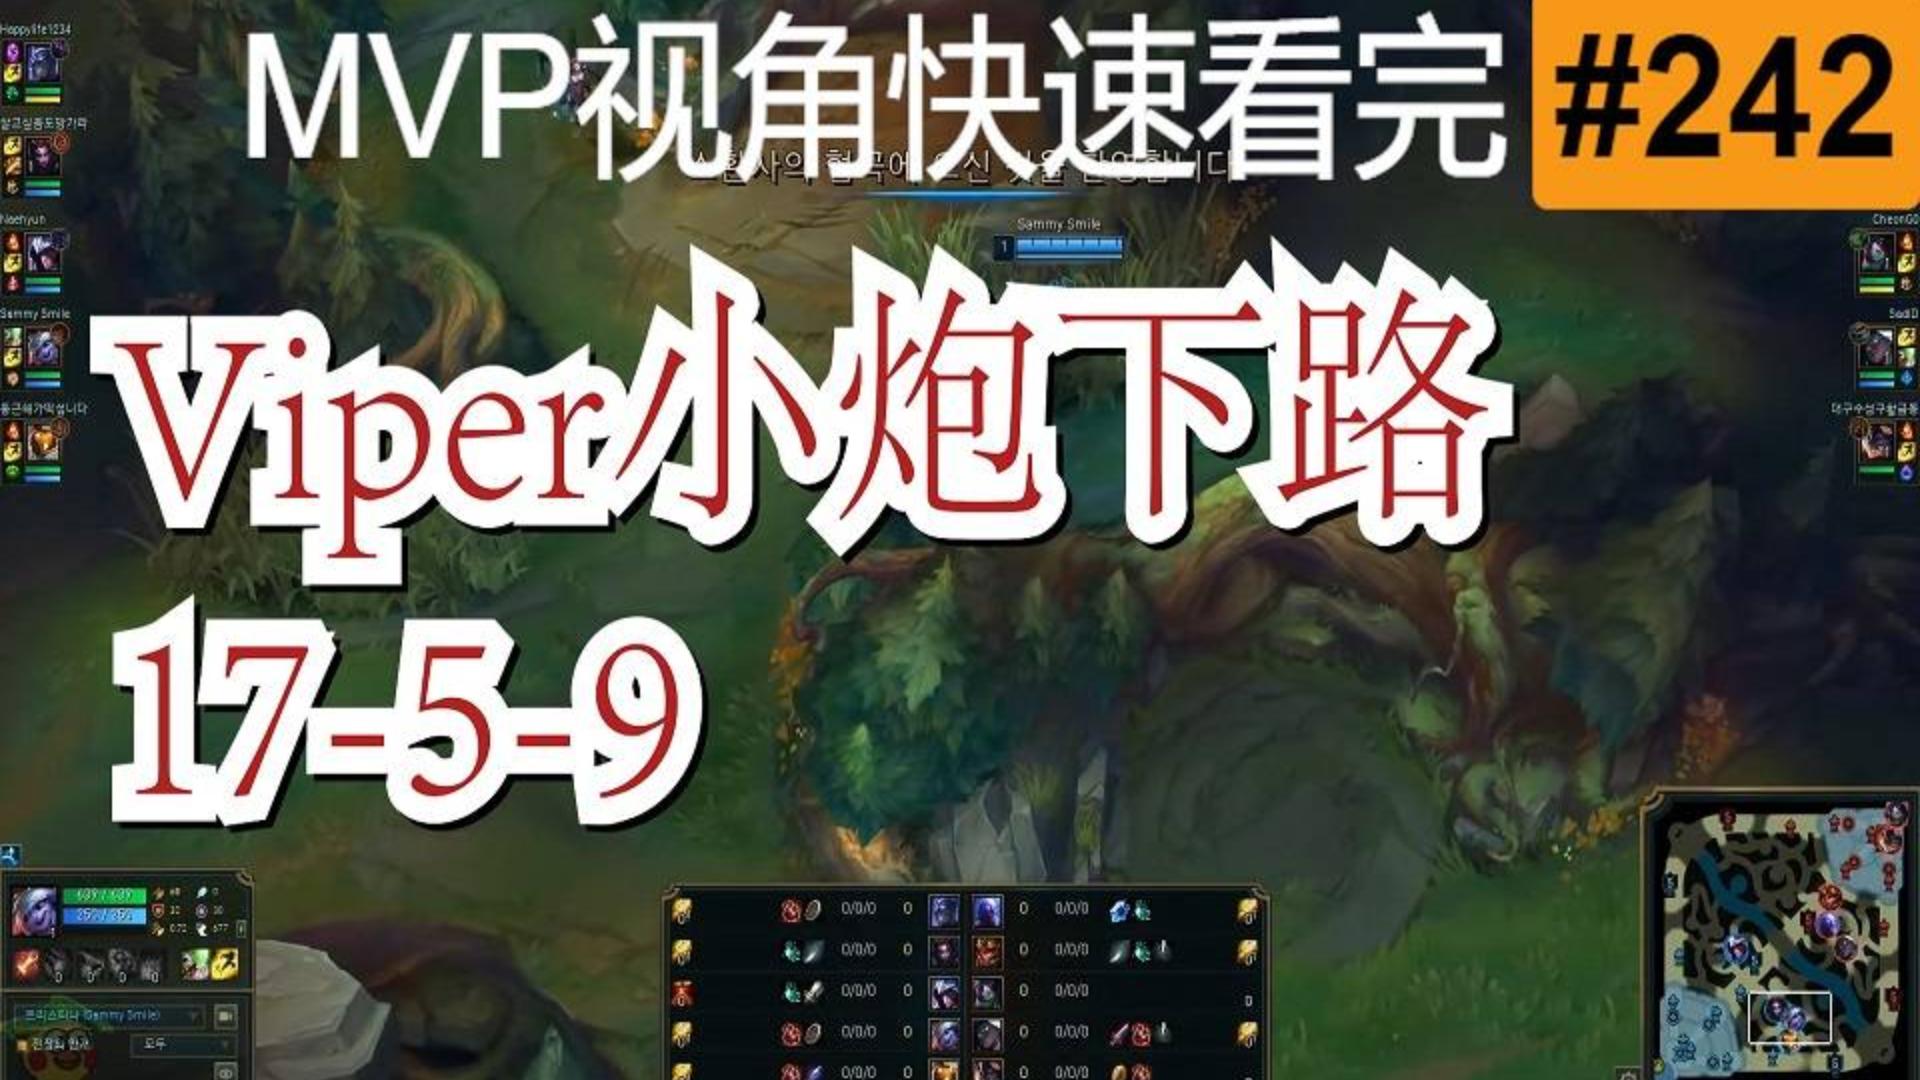 GRF.Viper小炮下路【MVP视角快速看完一局王者排位】#242